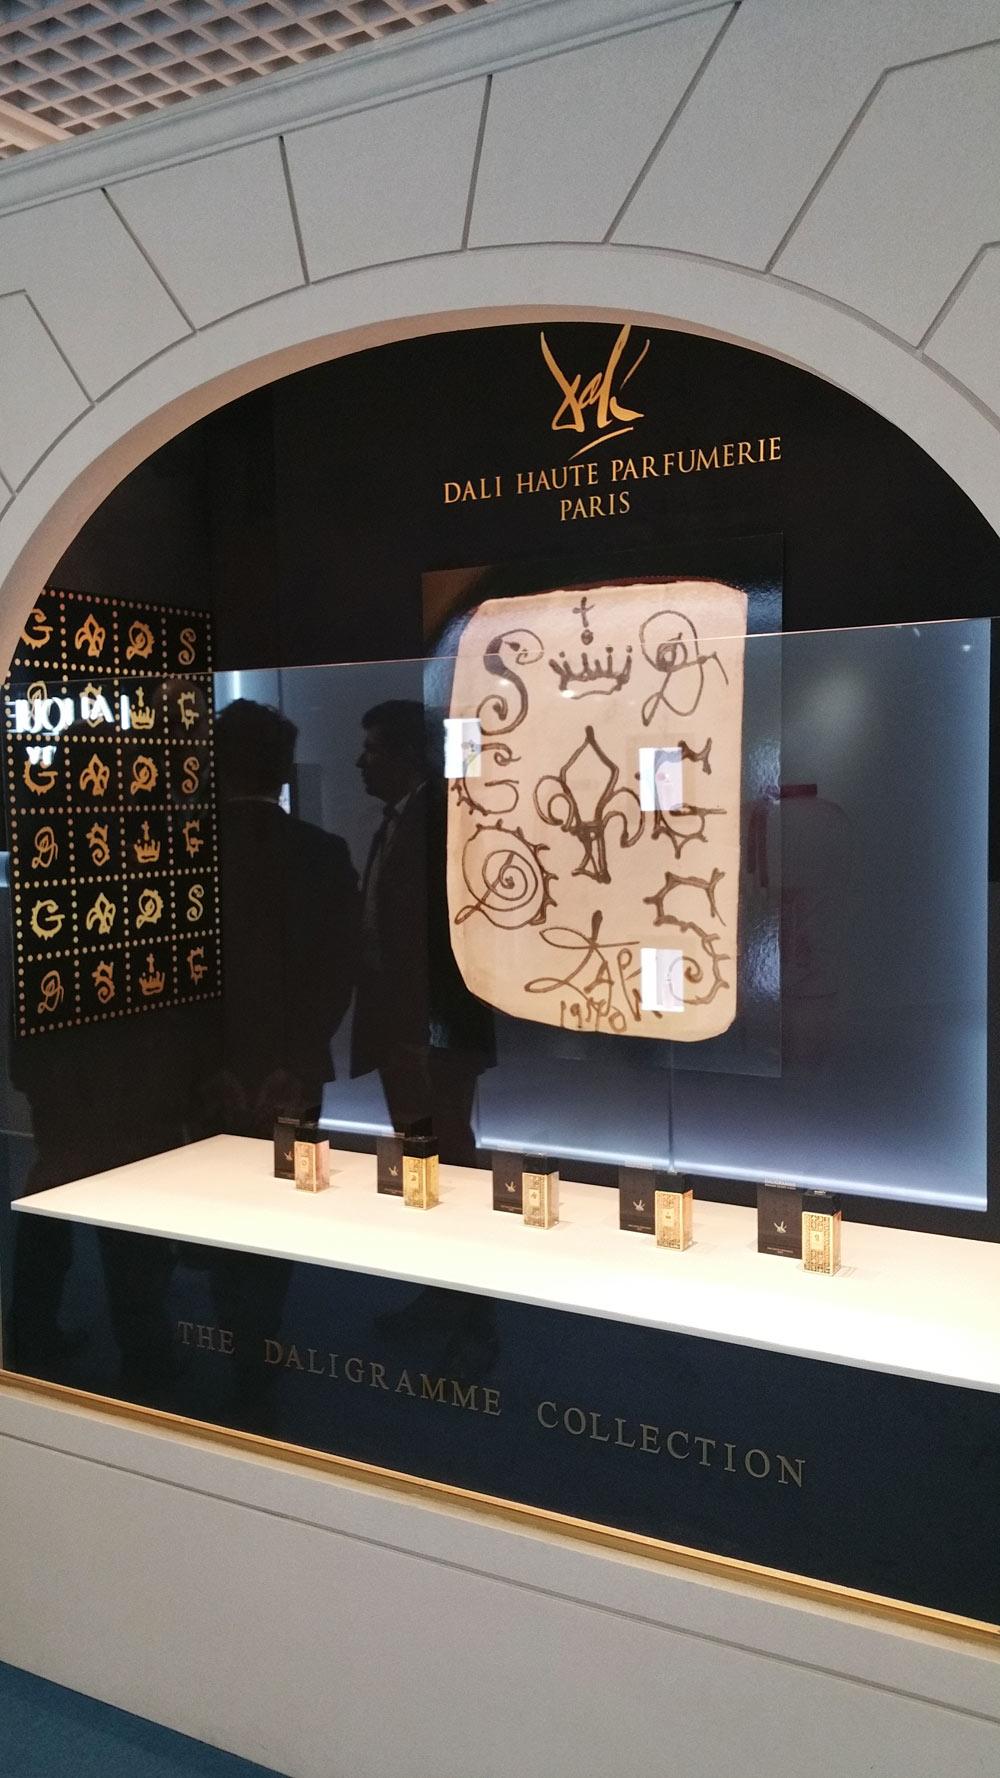 daligramme collection by salvador dali secret messages to gala new fragrances. Black Bedroom Furniture Sets. Home Design Ideas